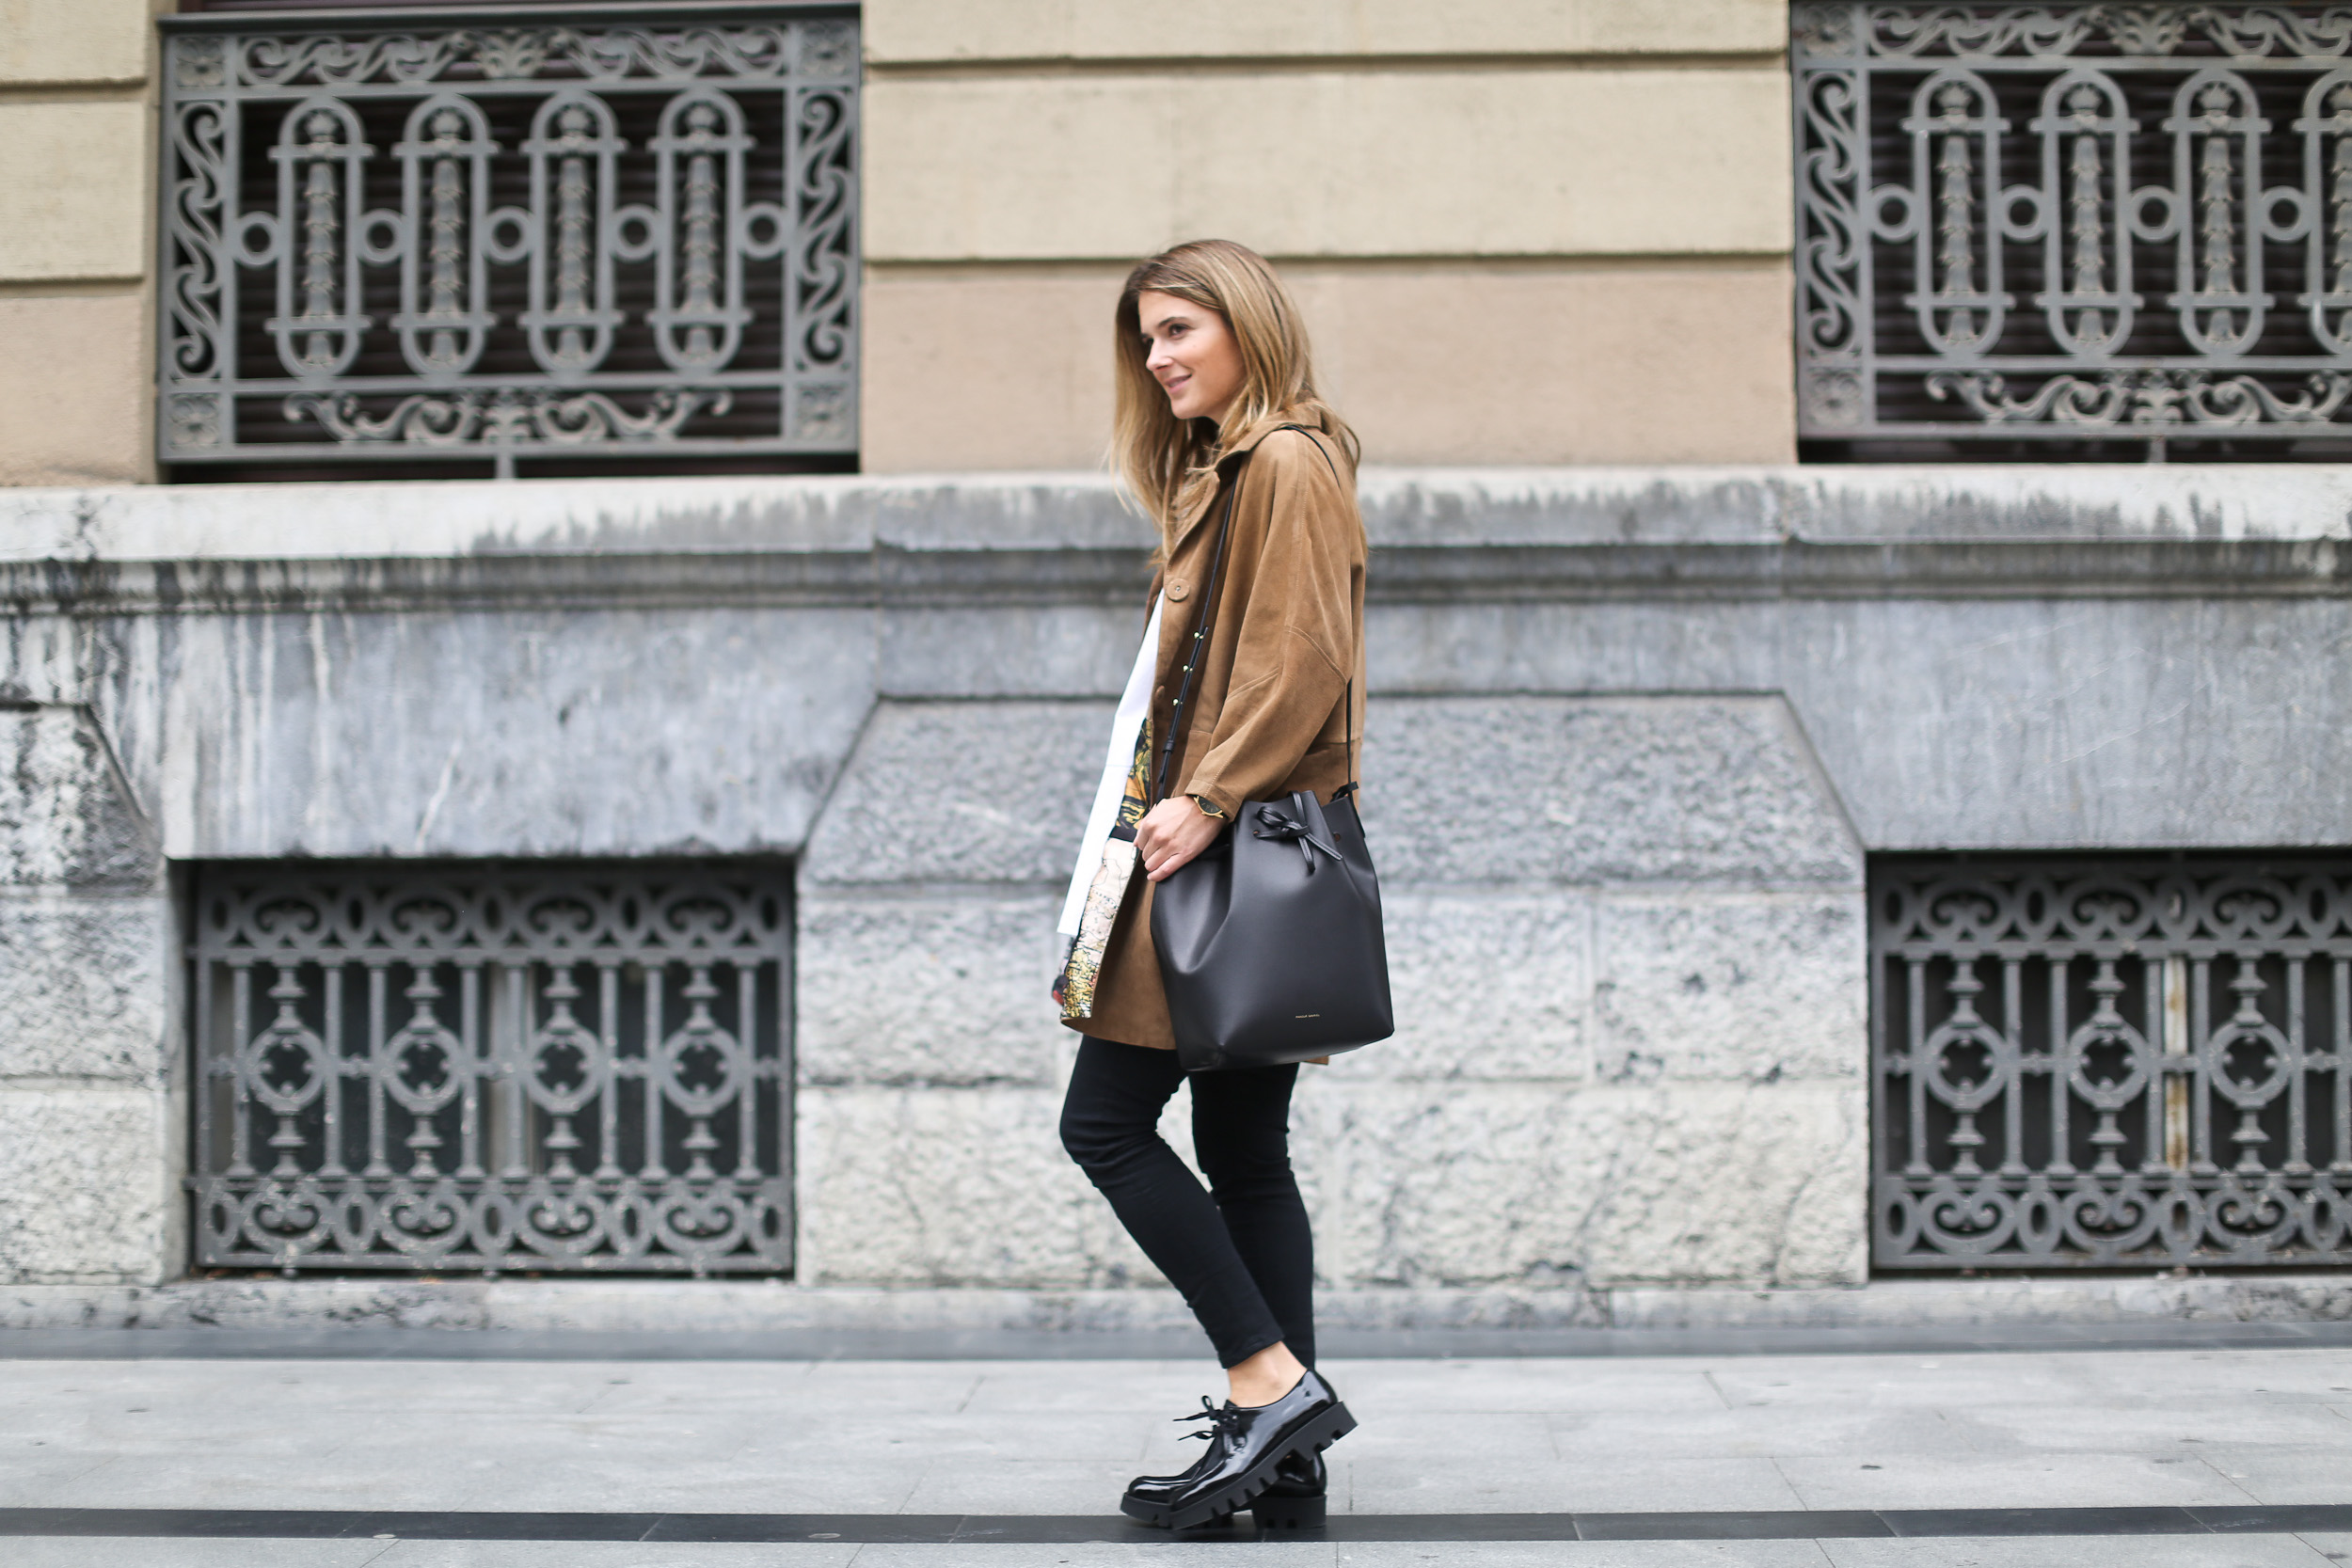 Clochet_streetstyle_boxcalf_chaqueta_ante_platform_brogues_masur_gavriel_bucket_bag